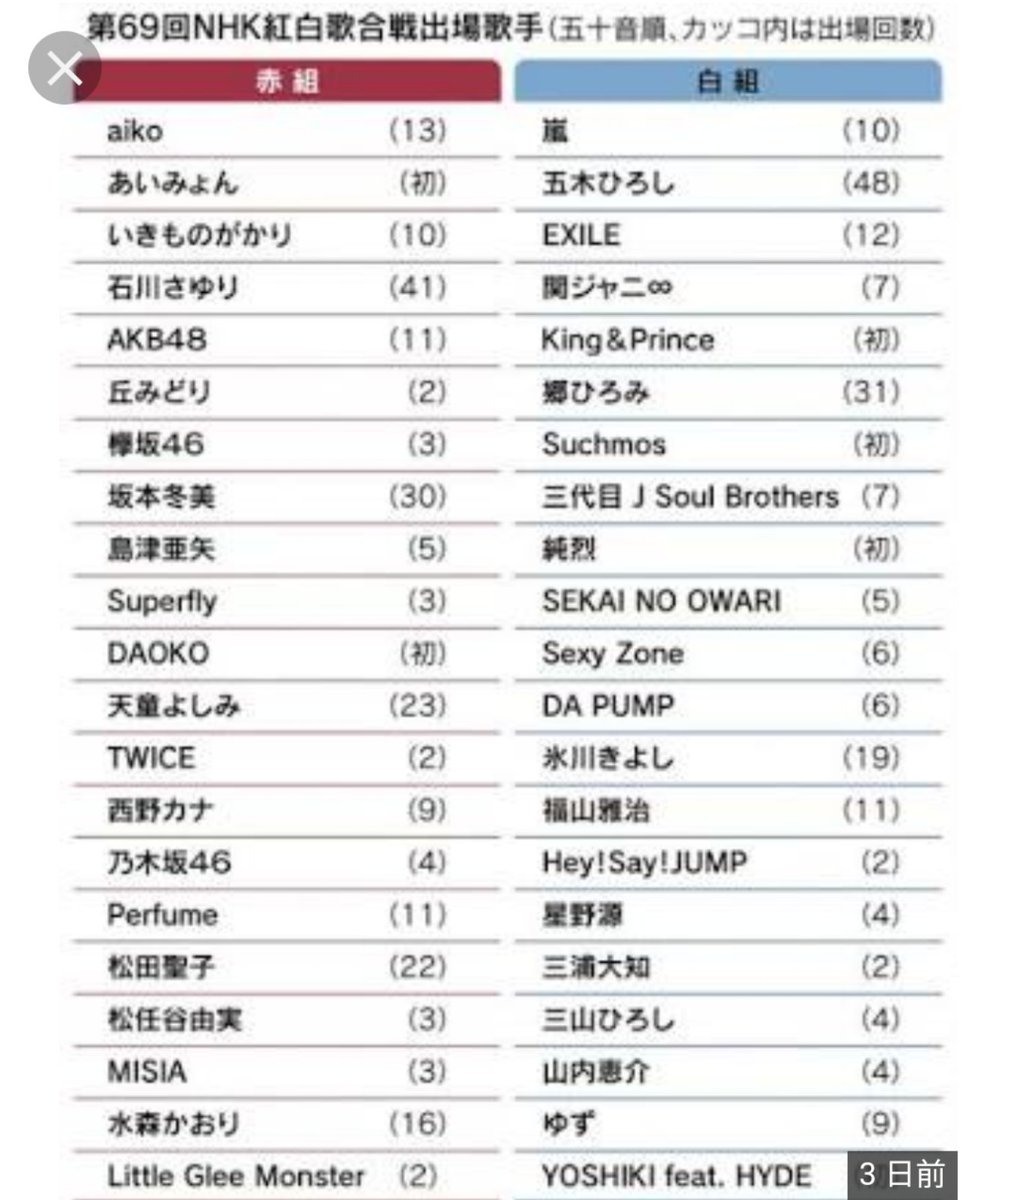 test ツイッターメディア - 今年の紅白は TWICE、三浦大知、Perfume、daoko、YOSHIKI feat. HYDE、ゆずあたりかな https://t.co/FJUOfaZubN